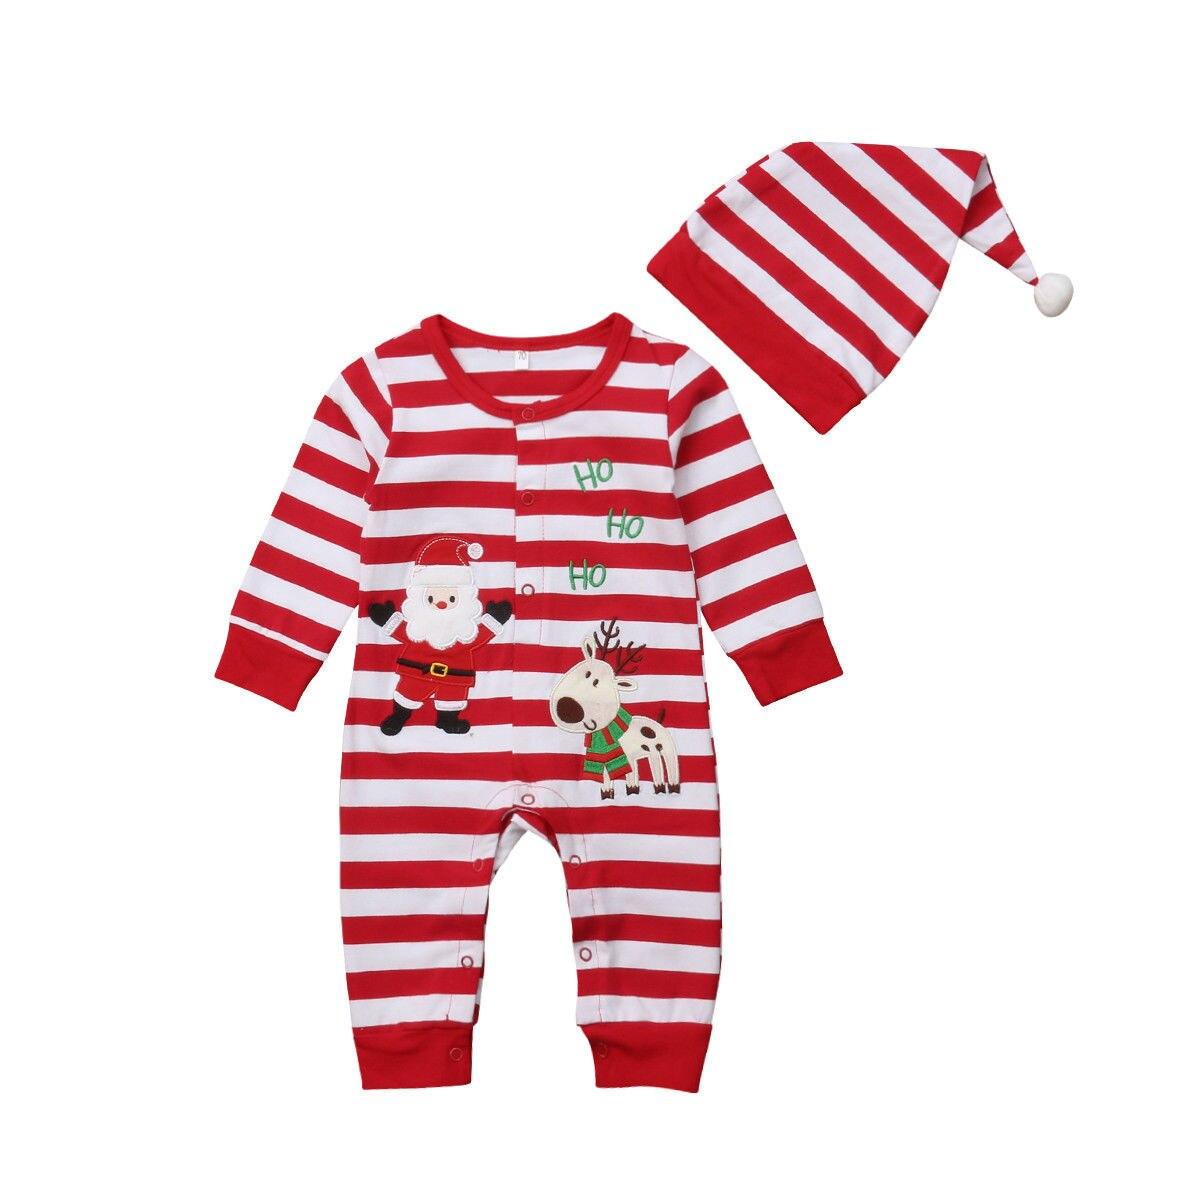 купить Boy Girl Cotton Romper Jumpsuit Hat Autumn Warm Party Clothes Outfit Xmas Newborn Inafnt Baby Boy Girl Clothing Stripe 0-24M по цене 506.58 рублей